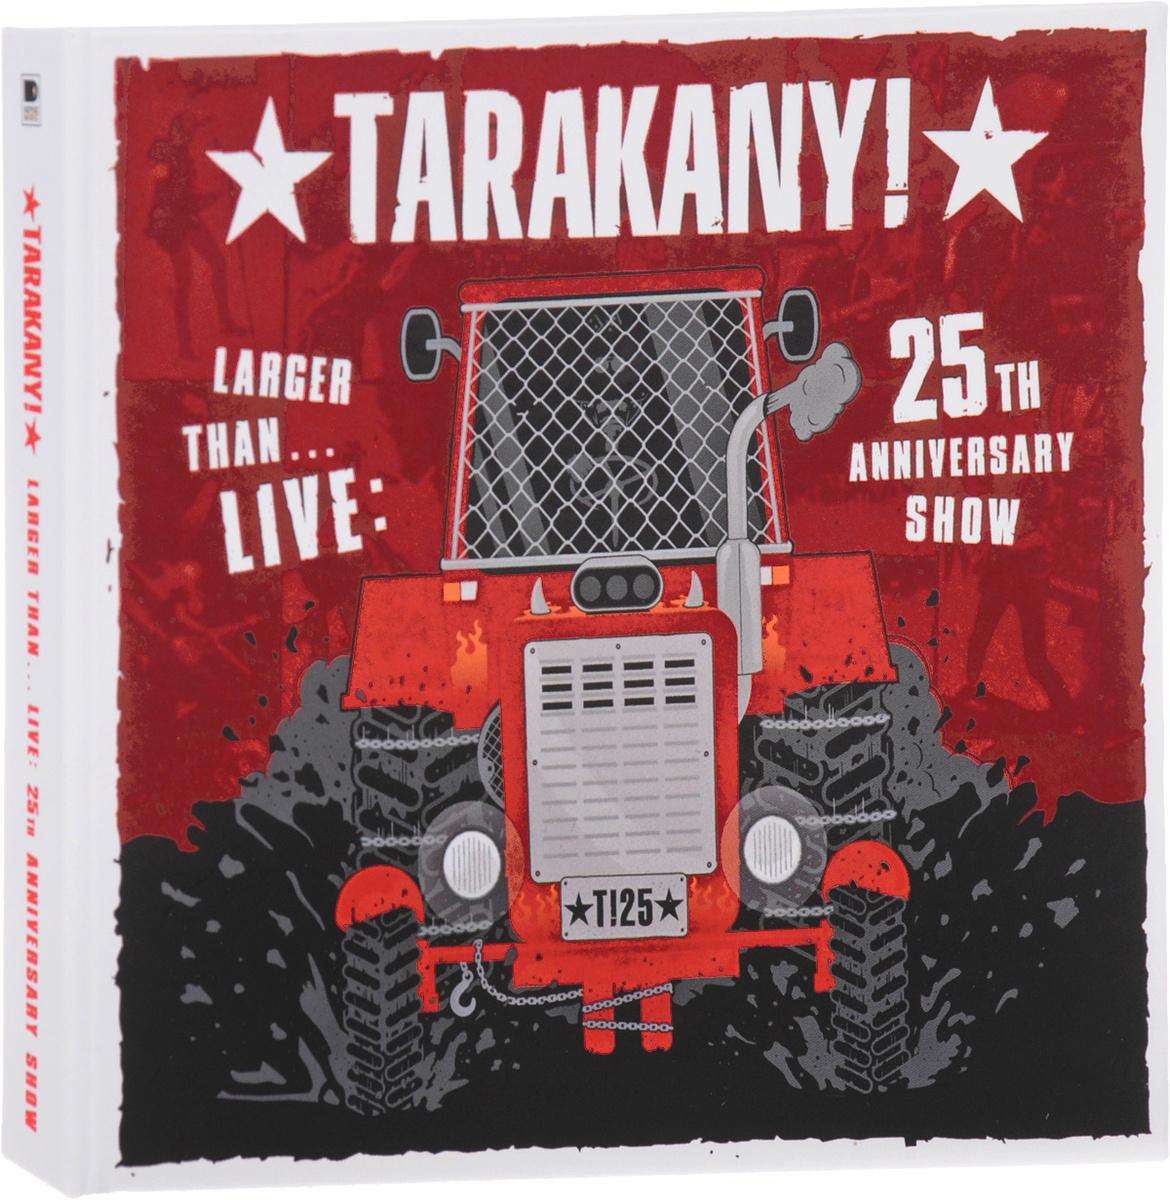 Tarakany! Larger Than... Live. 25th Anniversary Show (2 CD + DVD) #1